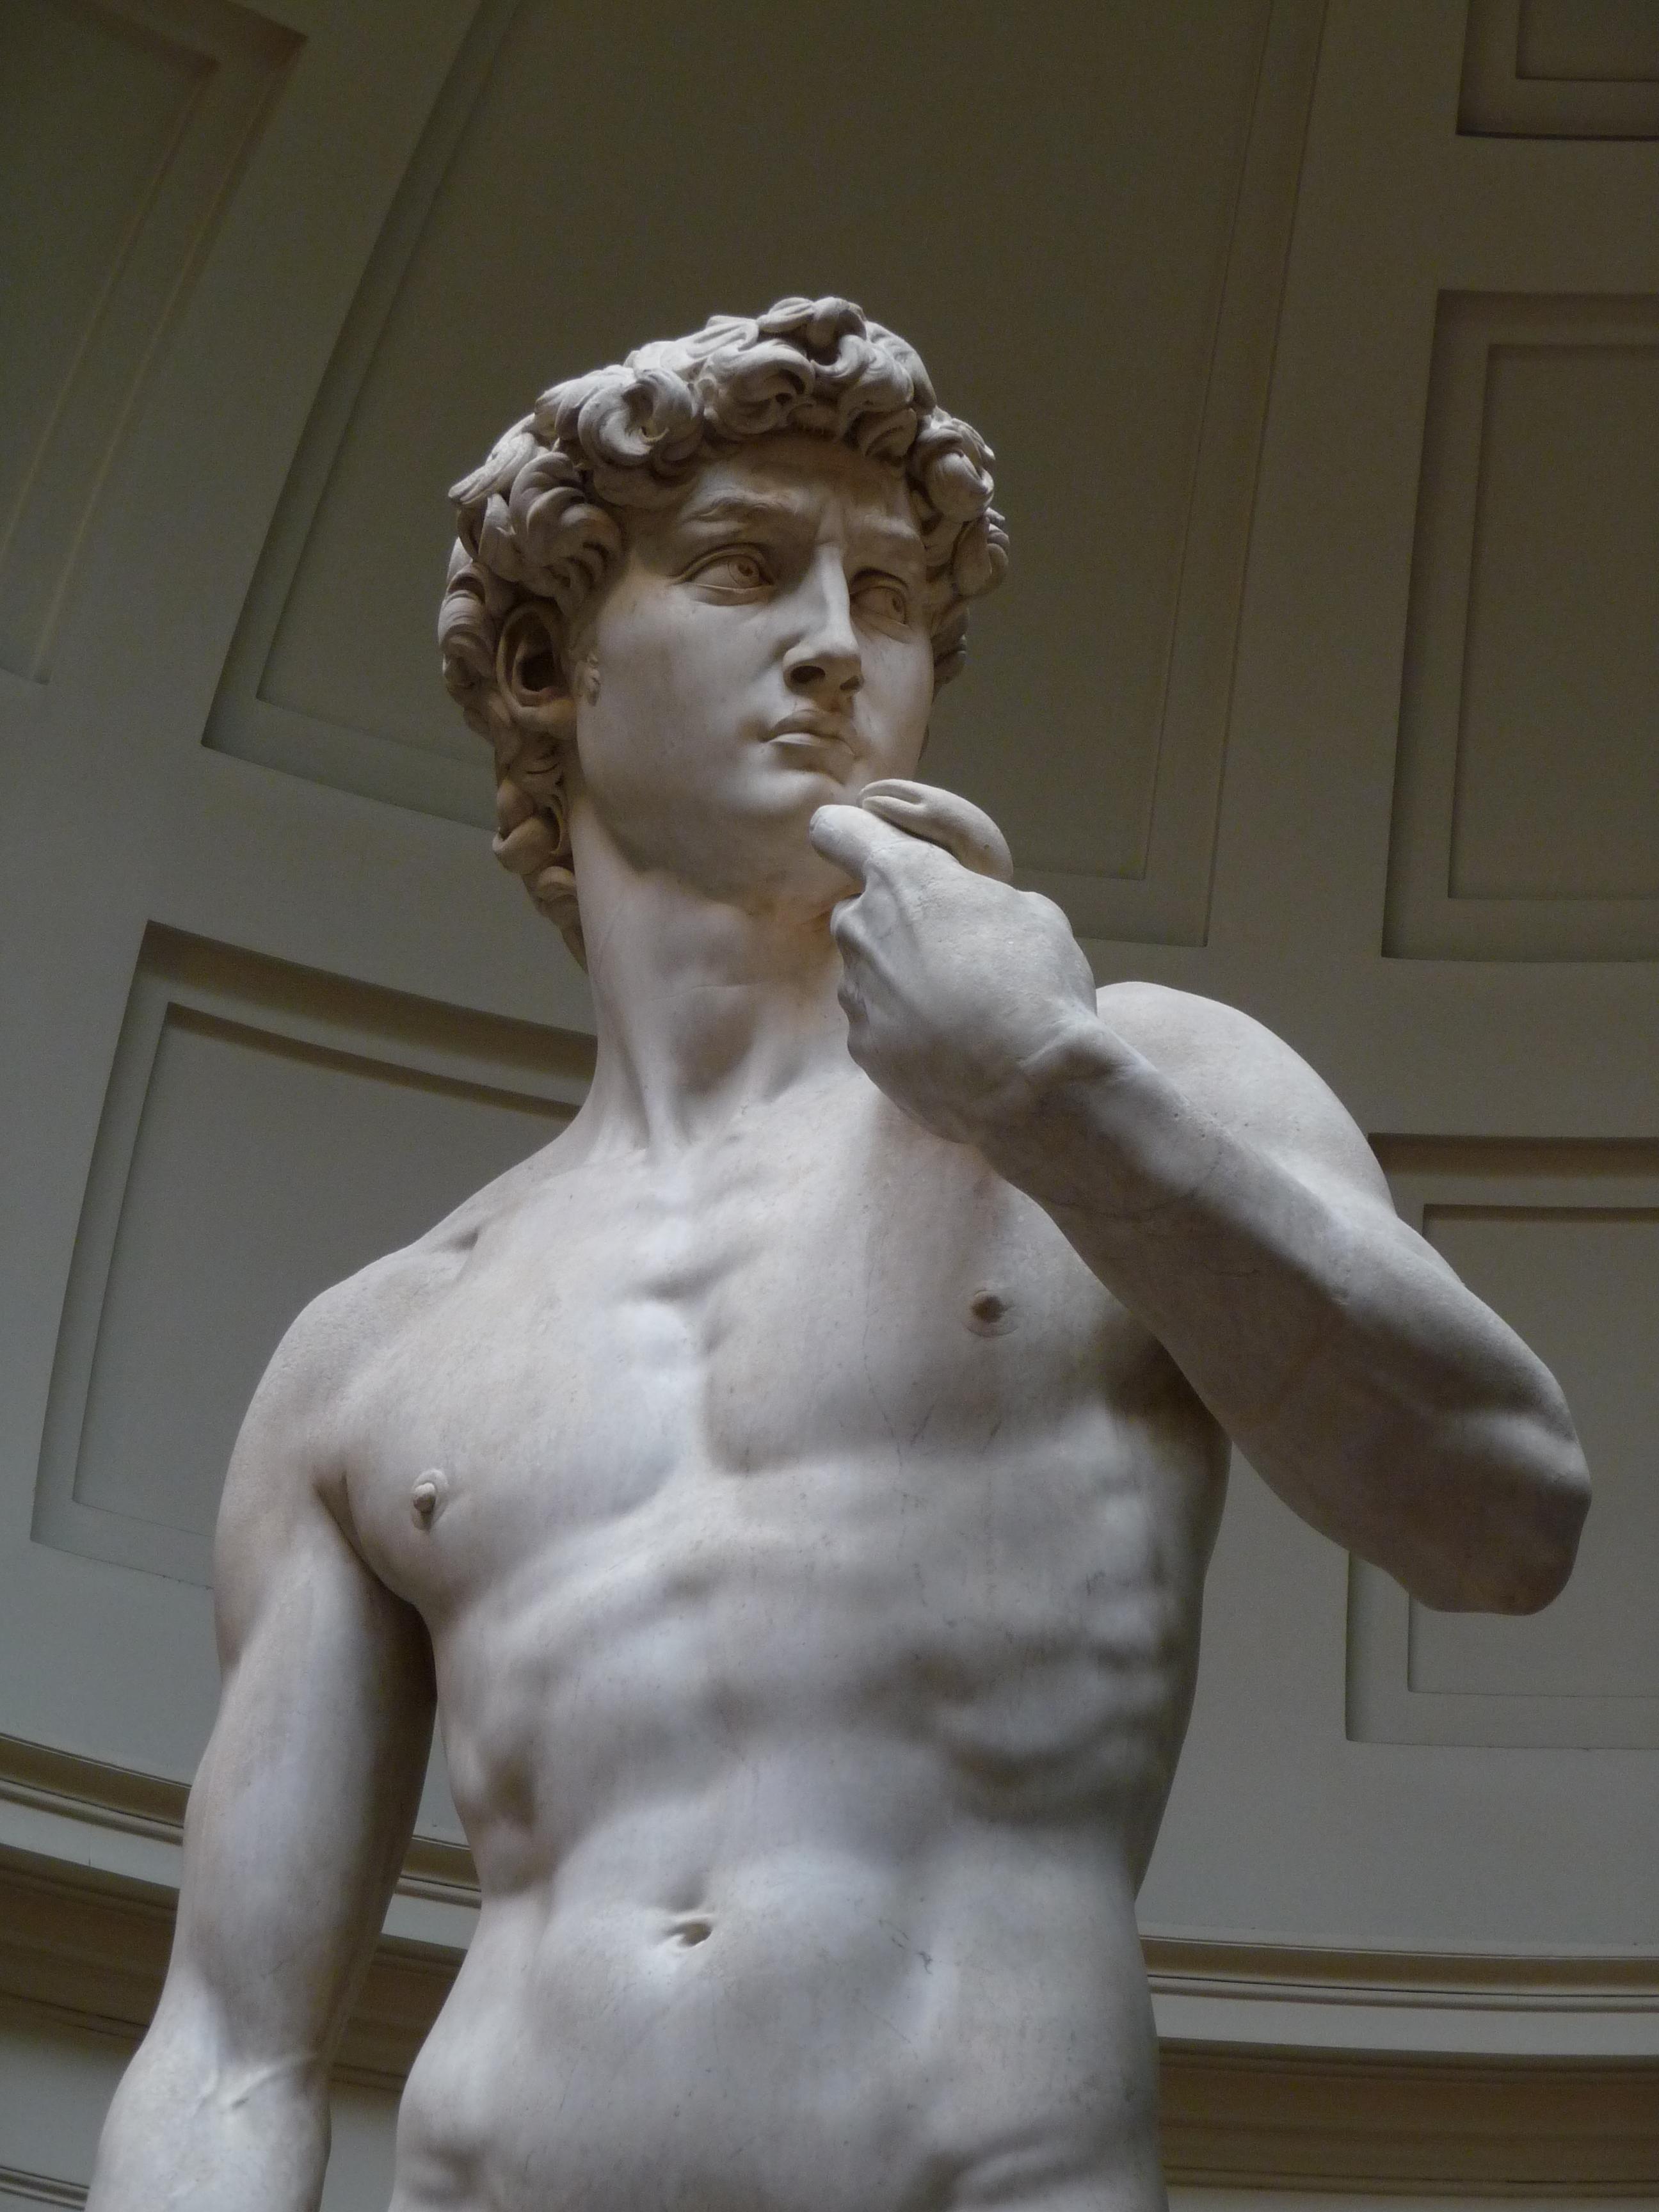 'David' by Michelangelo JBU06.JPG